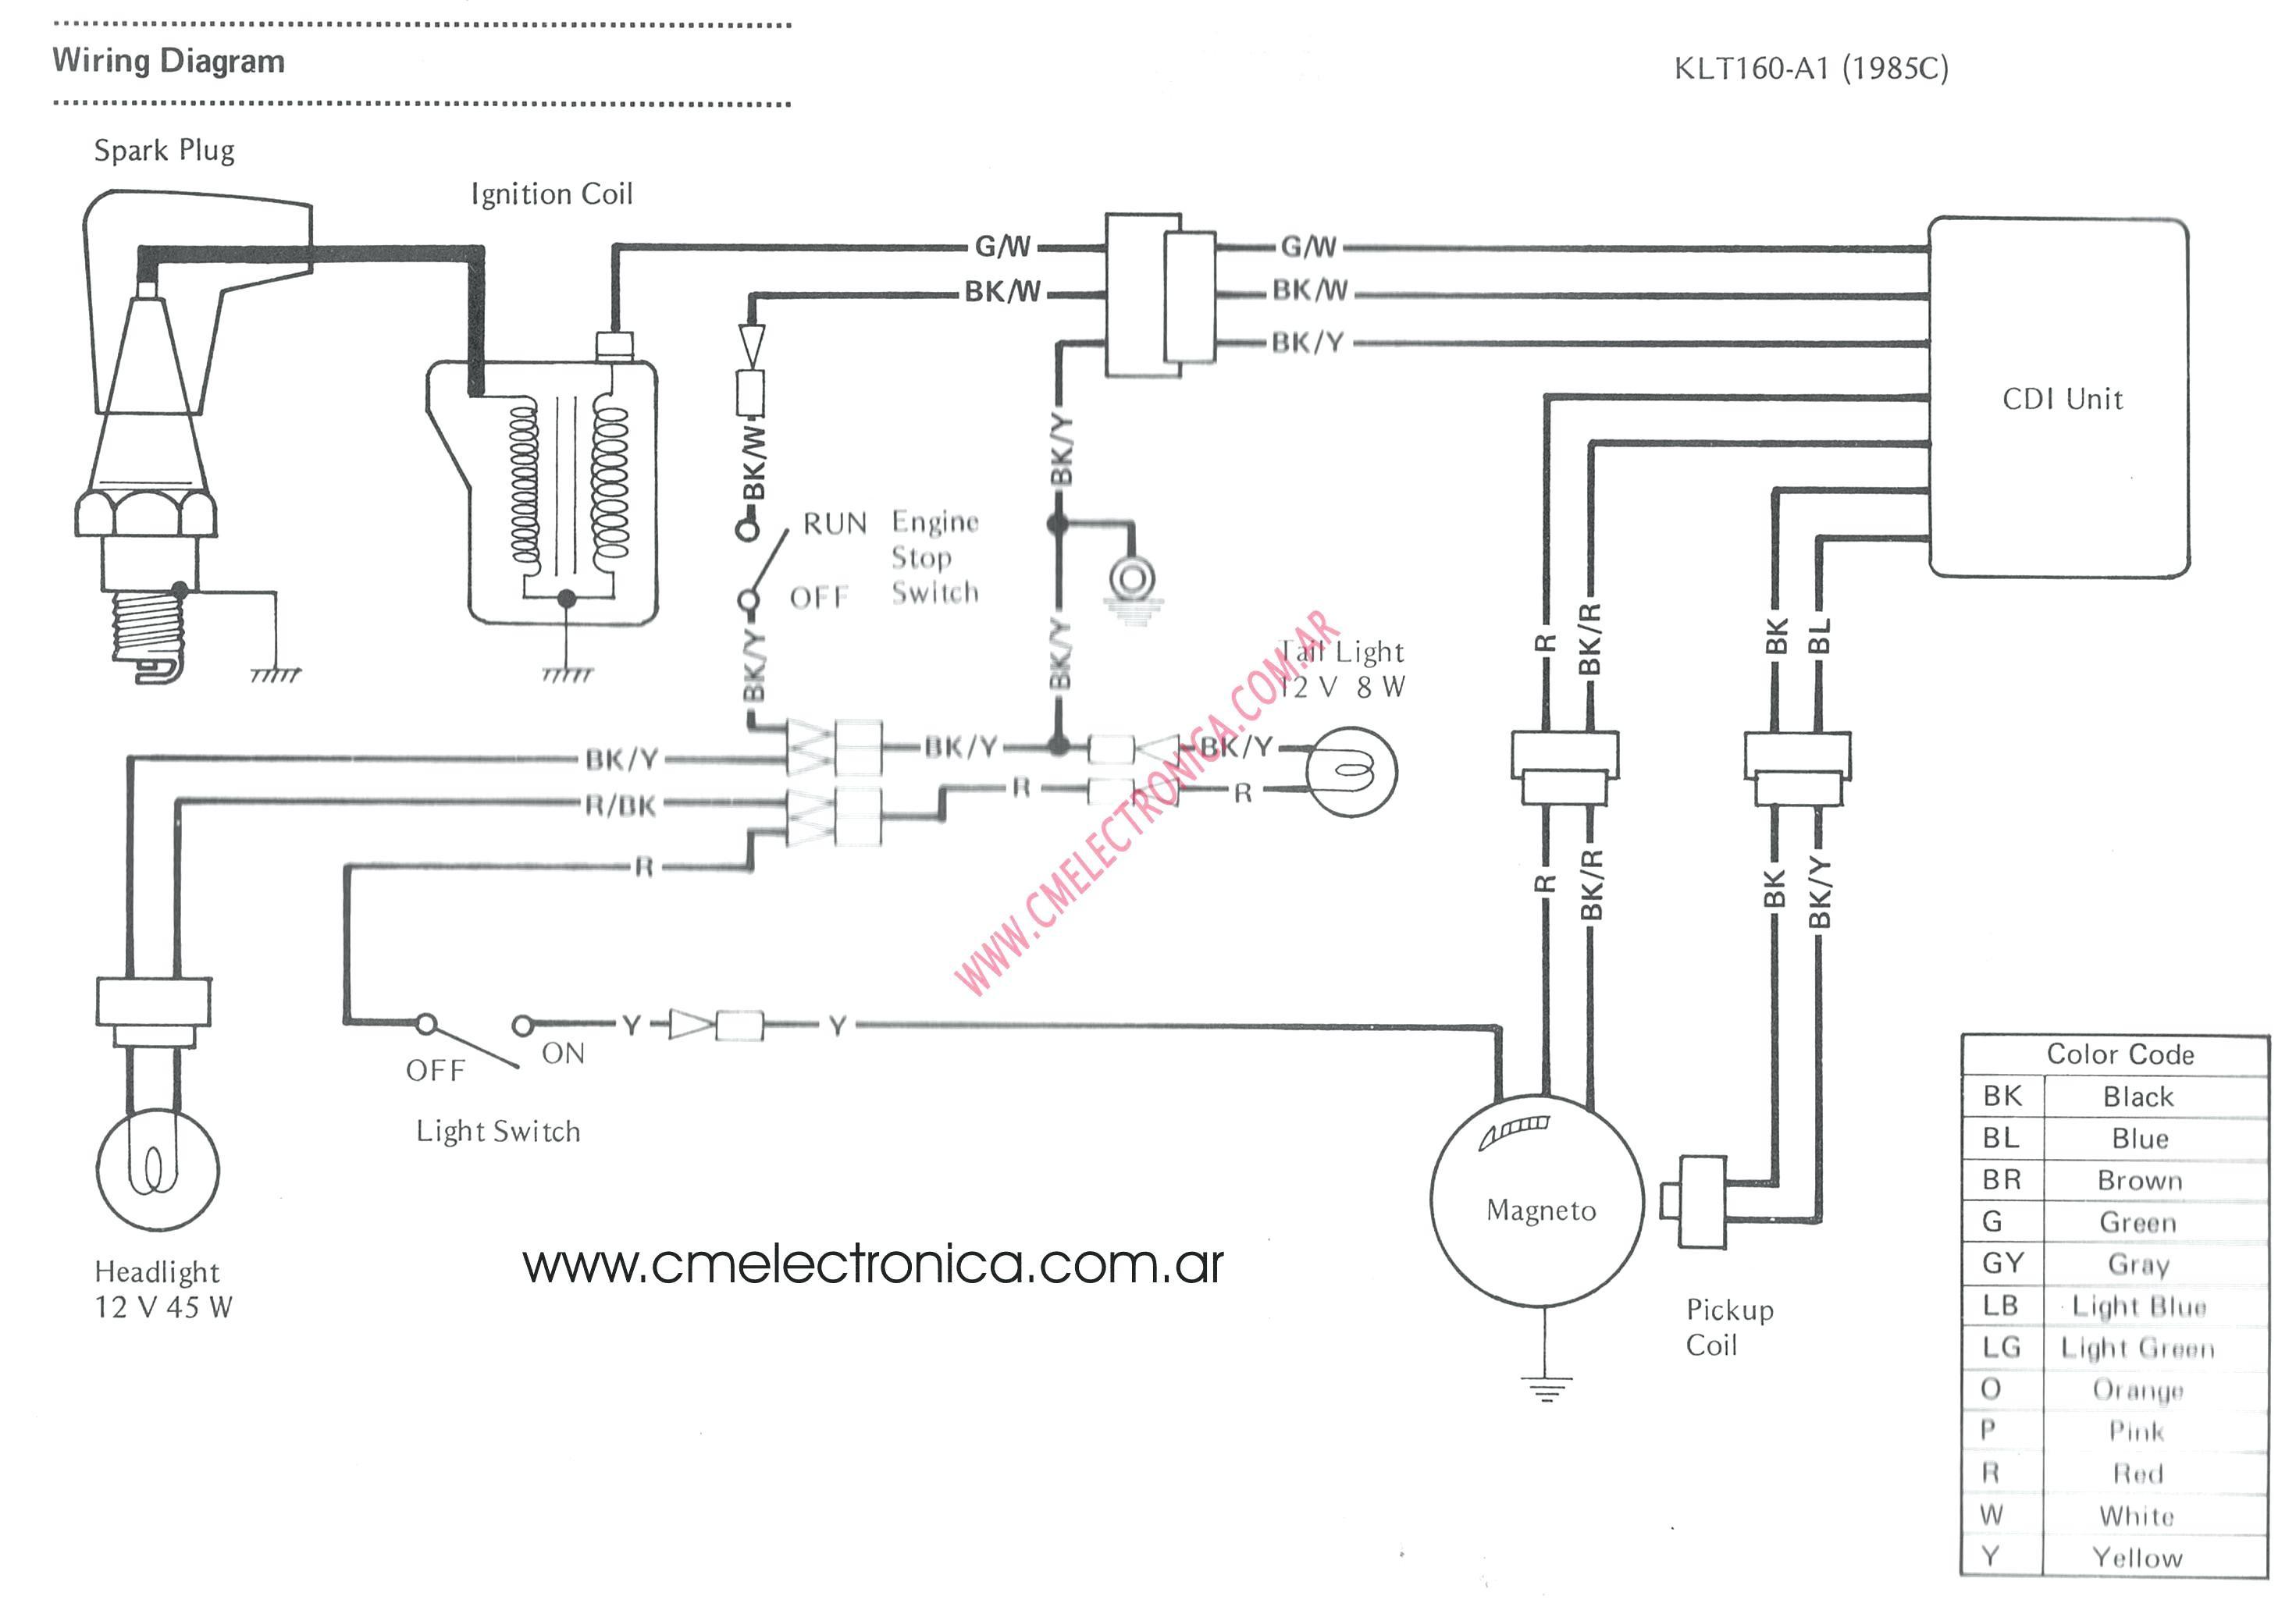 John Deere Gator Electrical Schematic | Wiring Library - John Deere Wiring Diagram Download